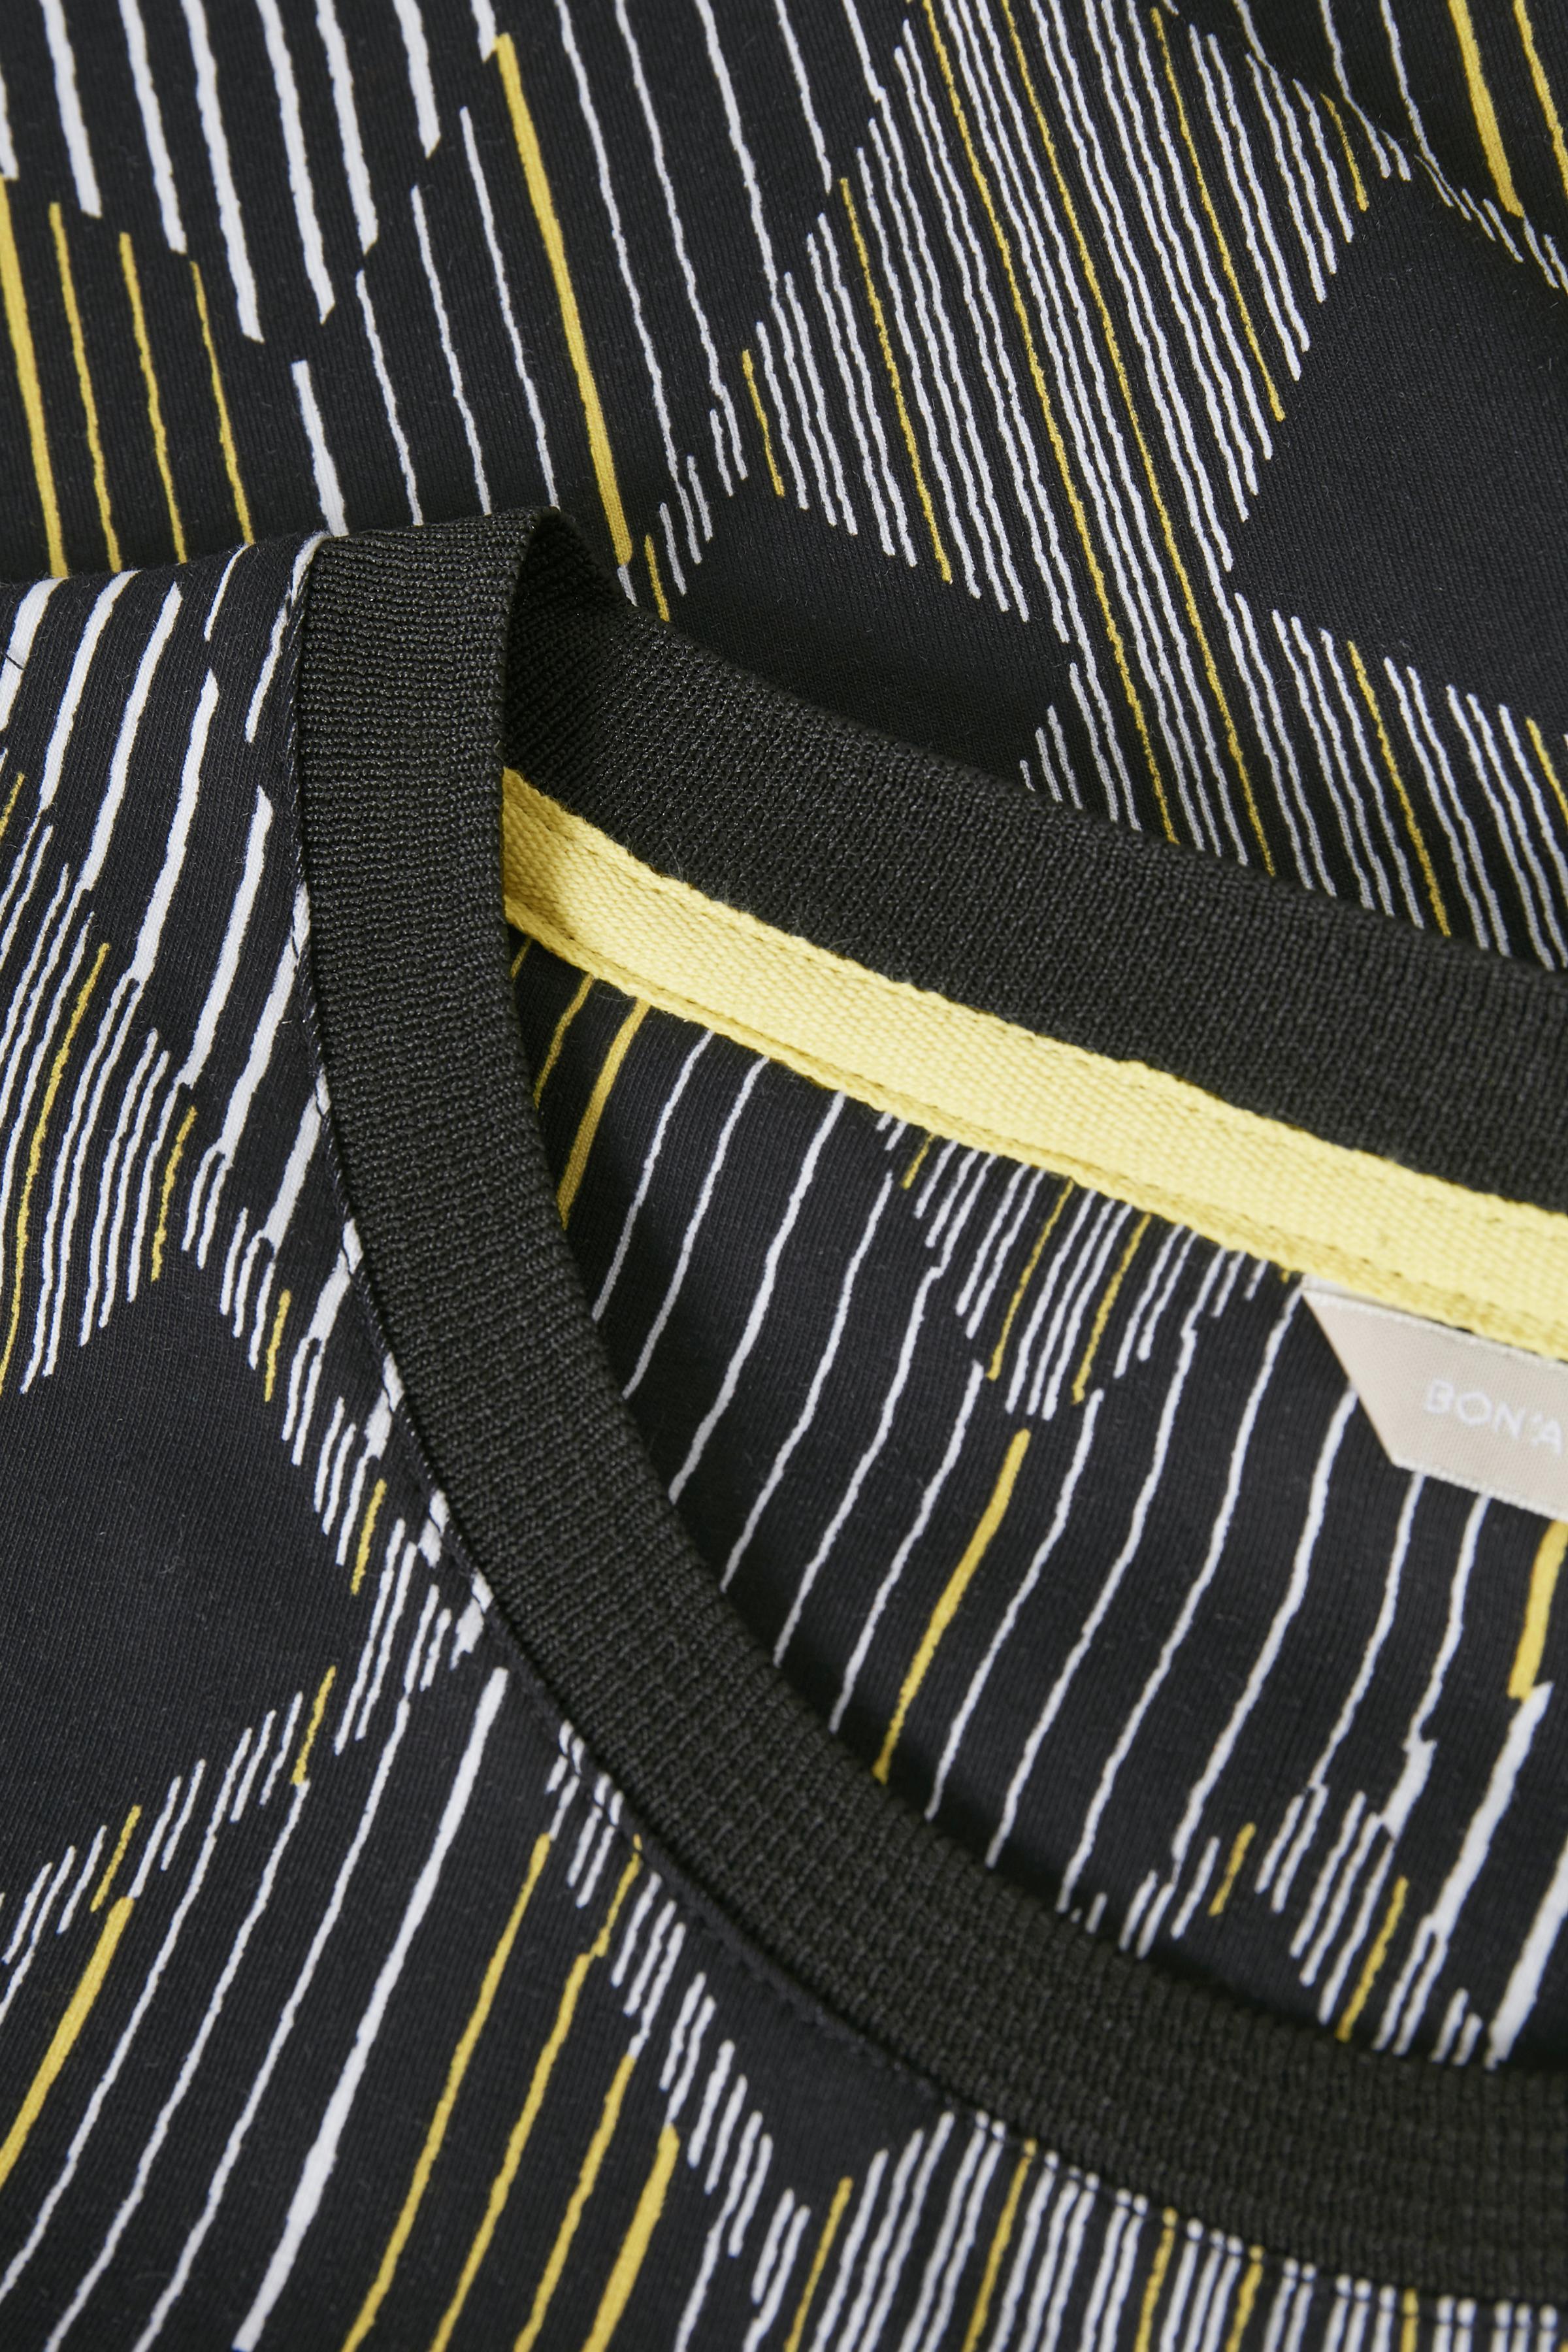 Sort/lys gul Kjole fra Bon'A Parte – Køb Sort/lys gul Kjole fra str. S-2XL her